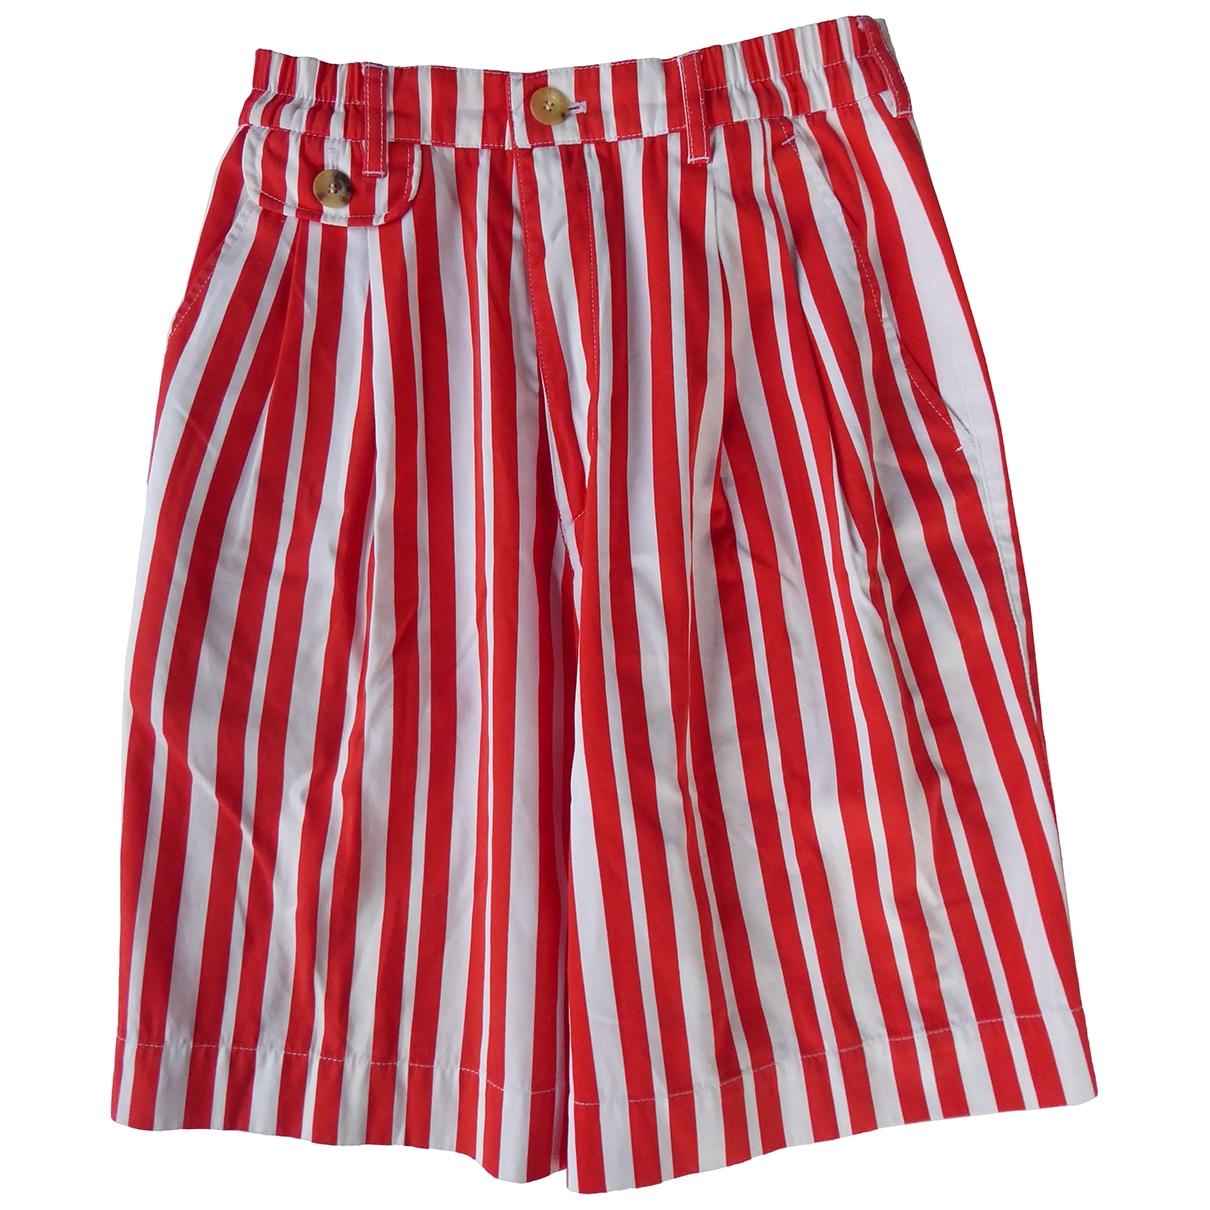 Bogner \N Red Cotton Shorts for Women 8 US